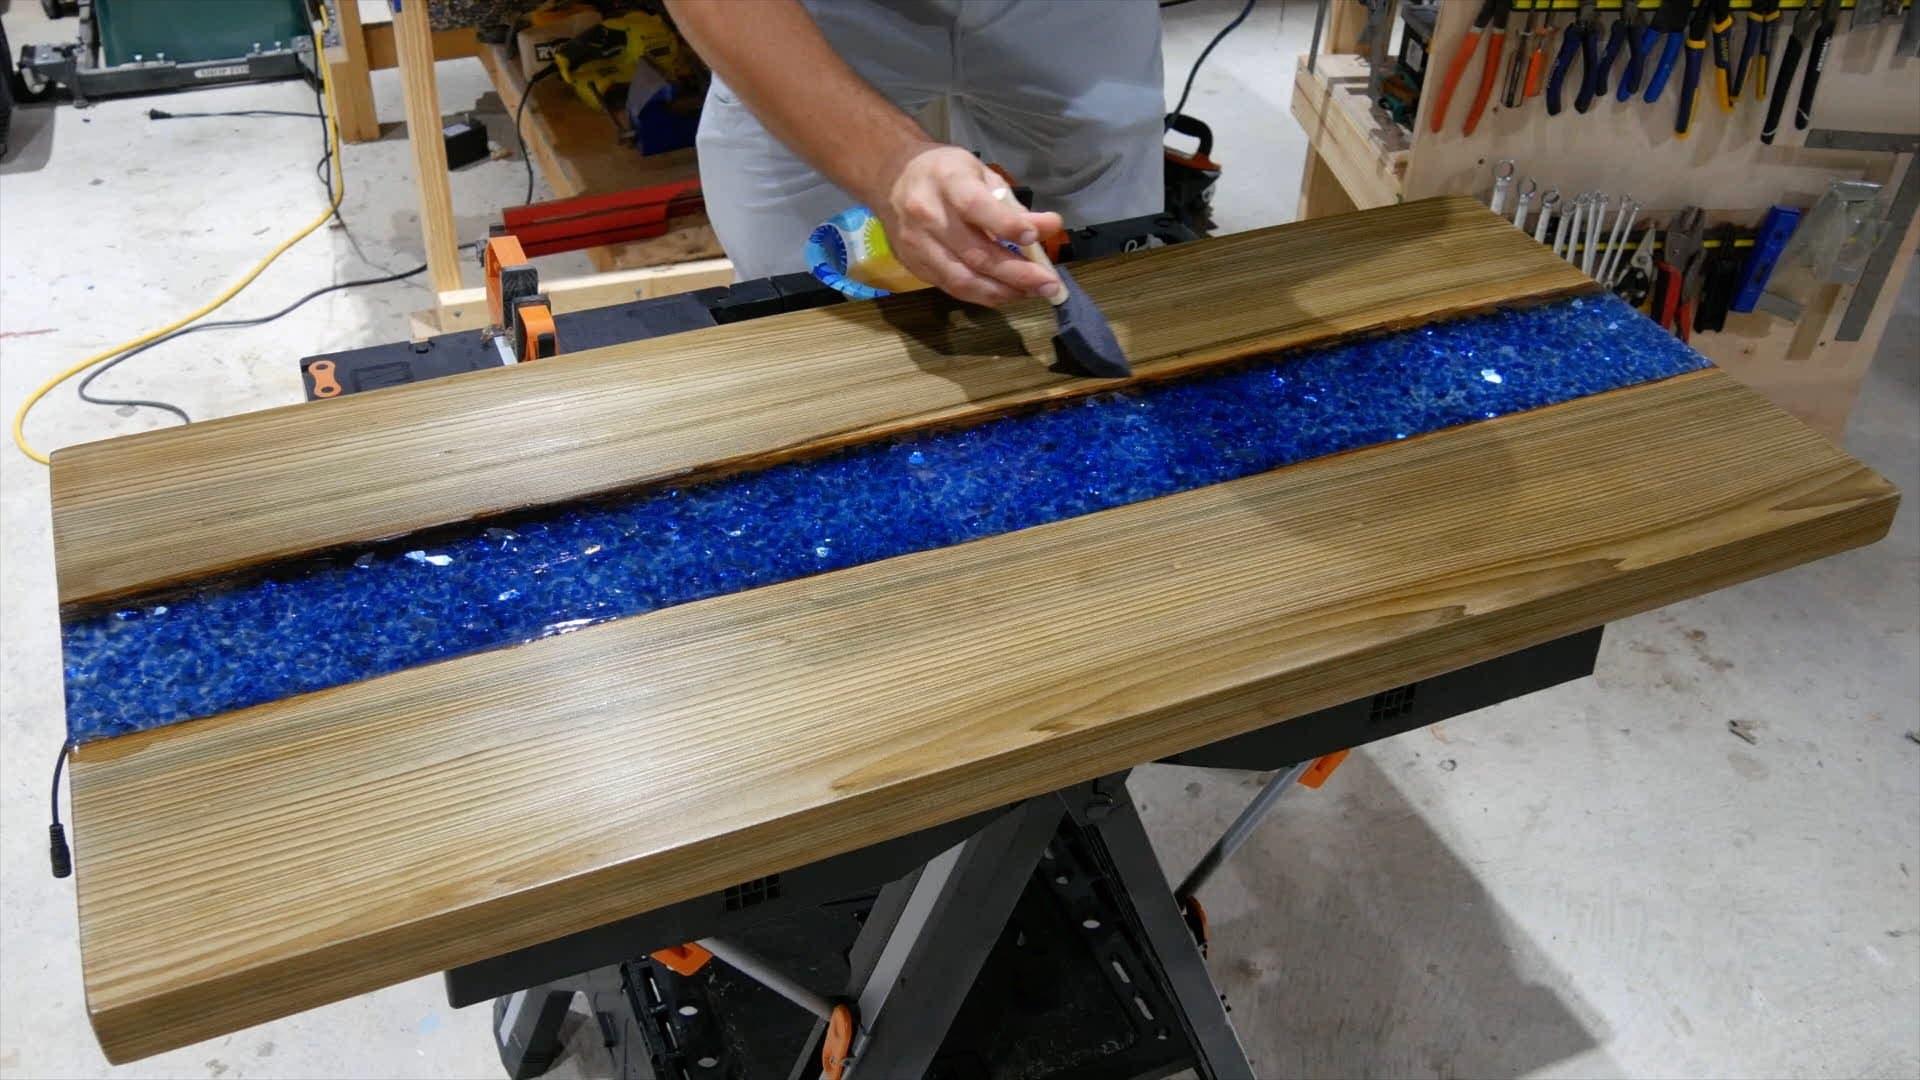 epoxy-resin-river-table-glowpowder_20171016_85